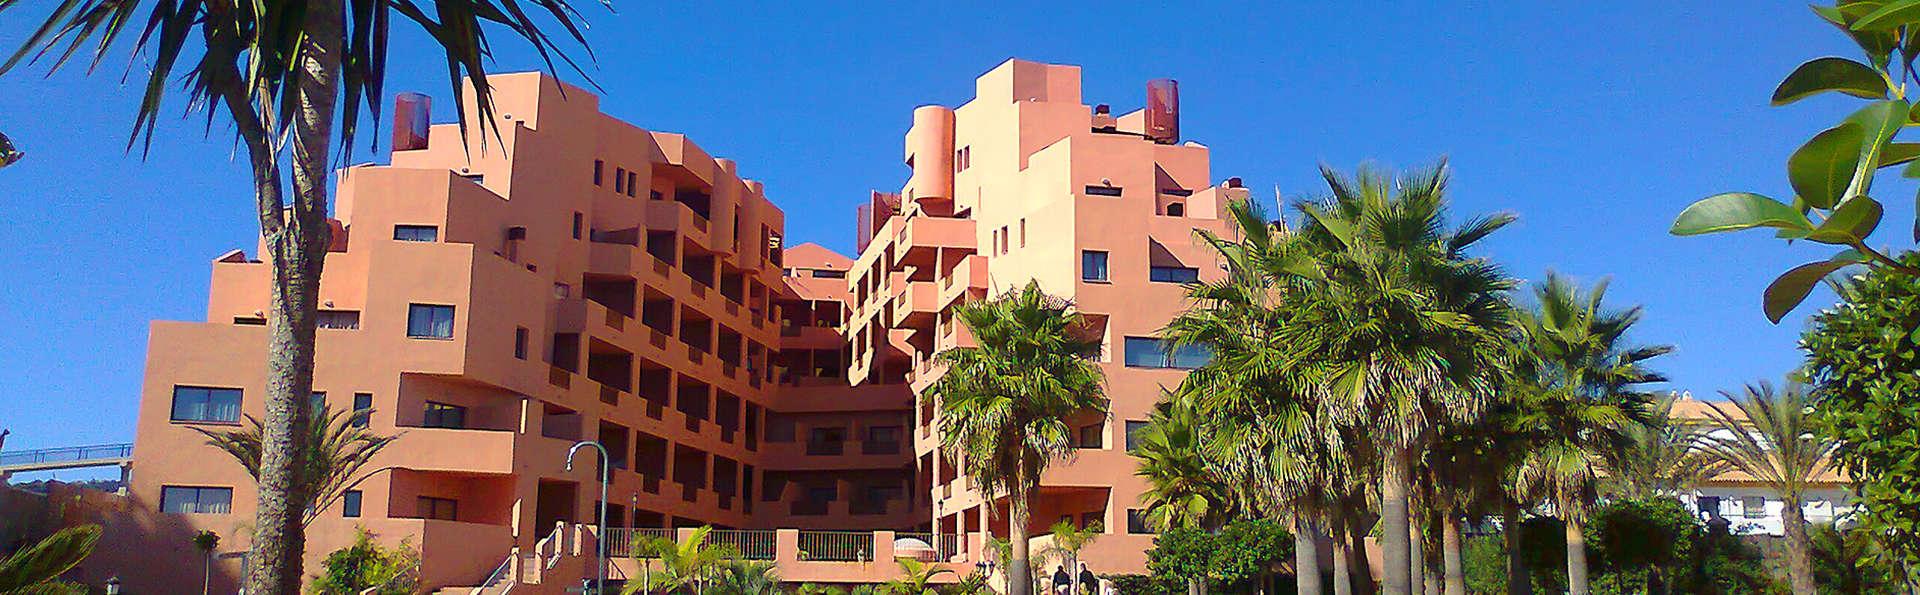 Apartamentos Turísticos Don Juan - EDIT_Exterior.jpg